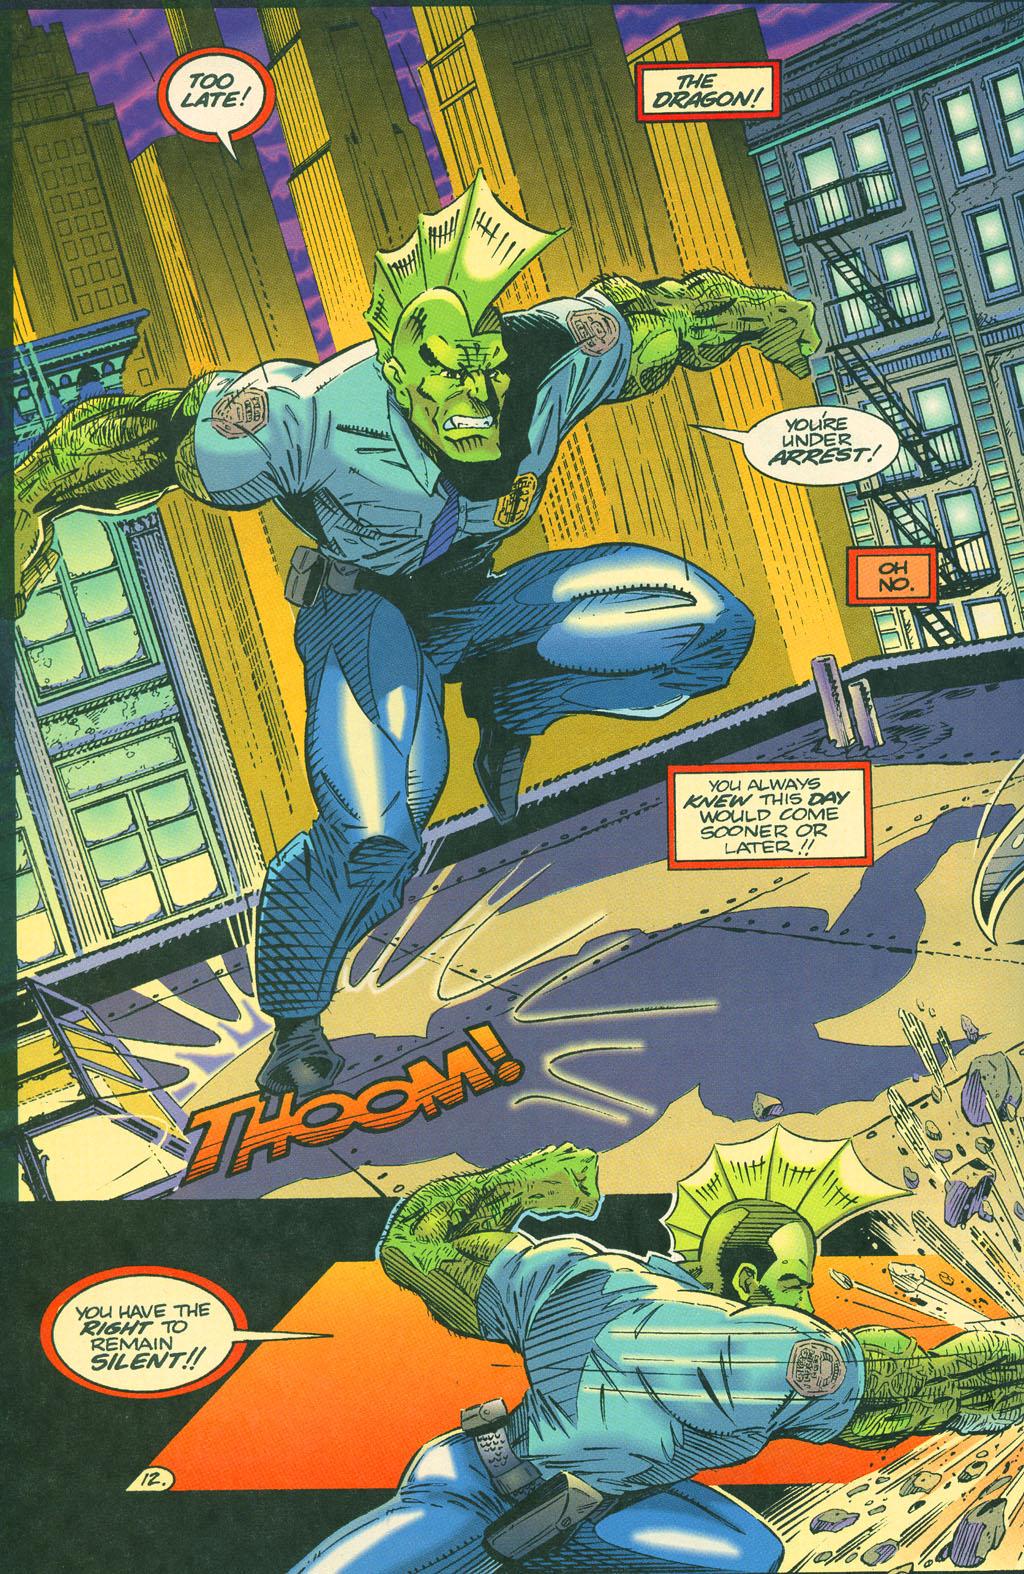 Read online ShadowHawk comic -  Issue #4 - 15